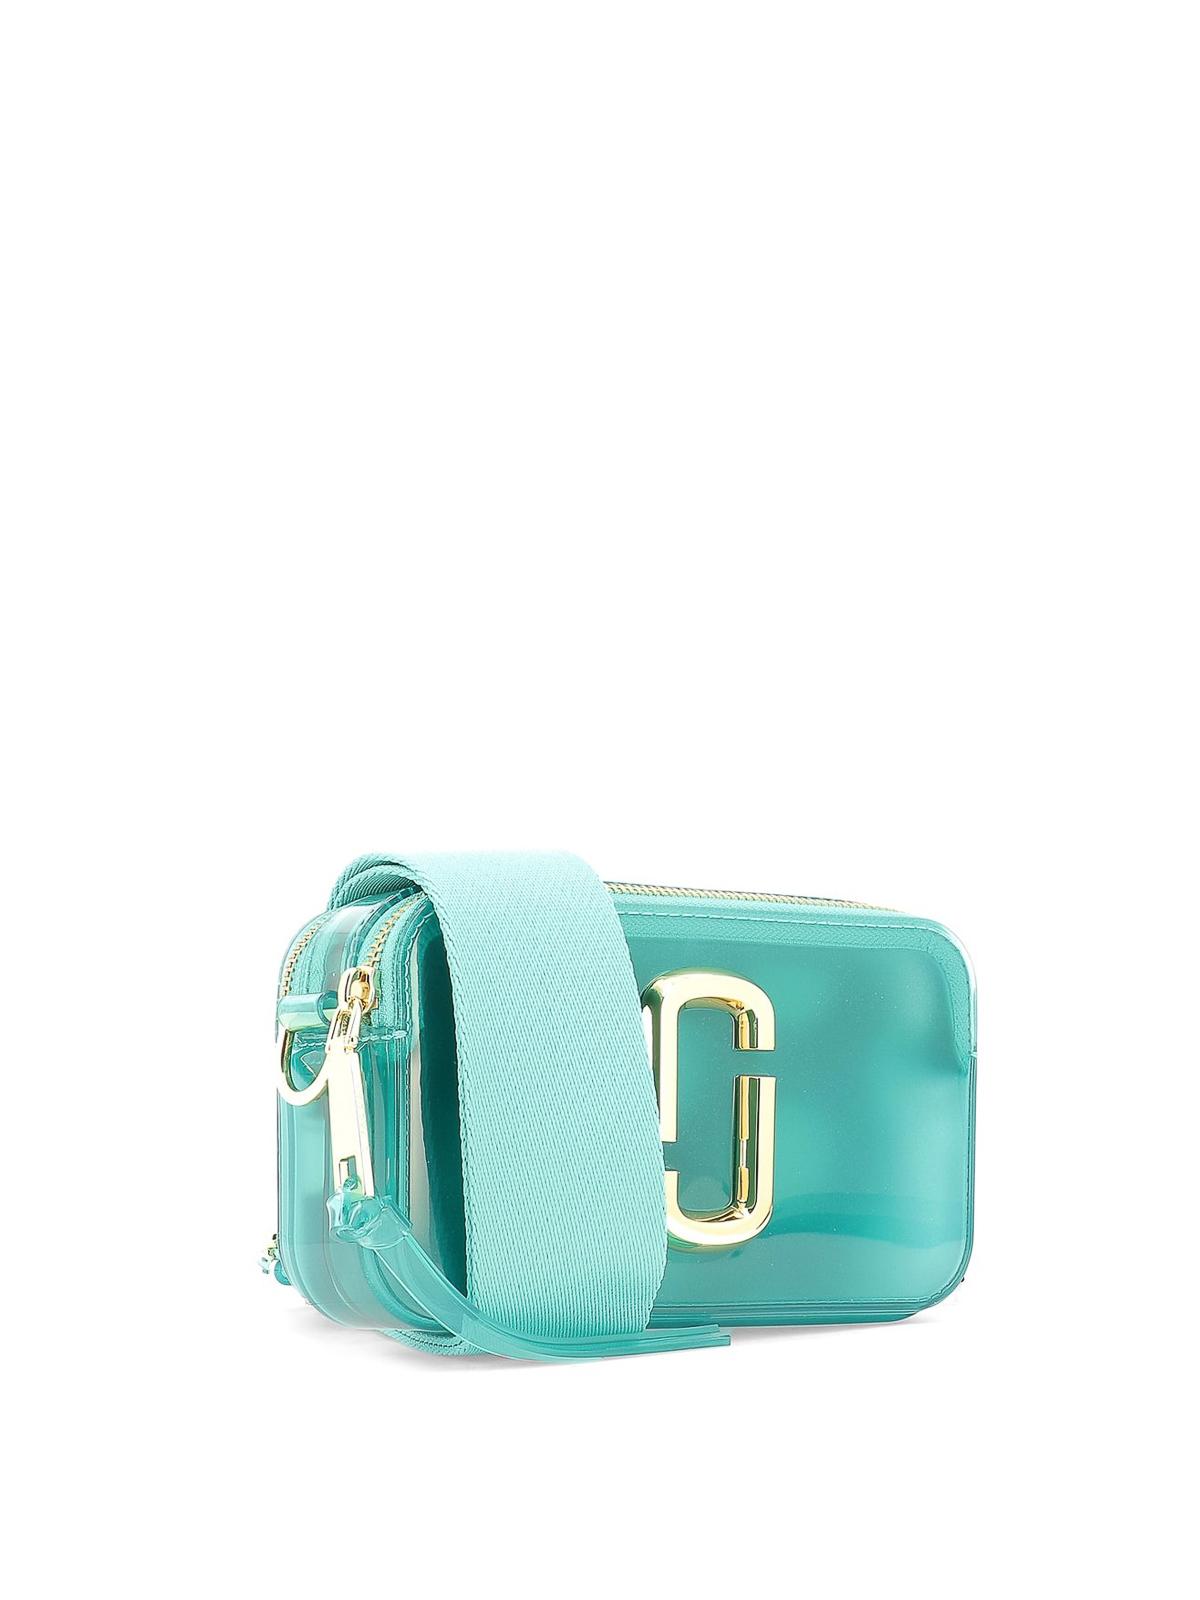 Marc Jacobs Borsa Snapshot in plastica azzurra borse a